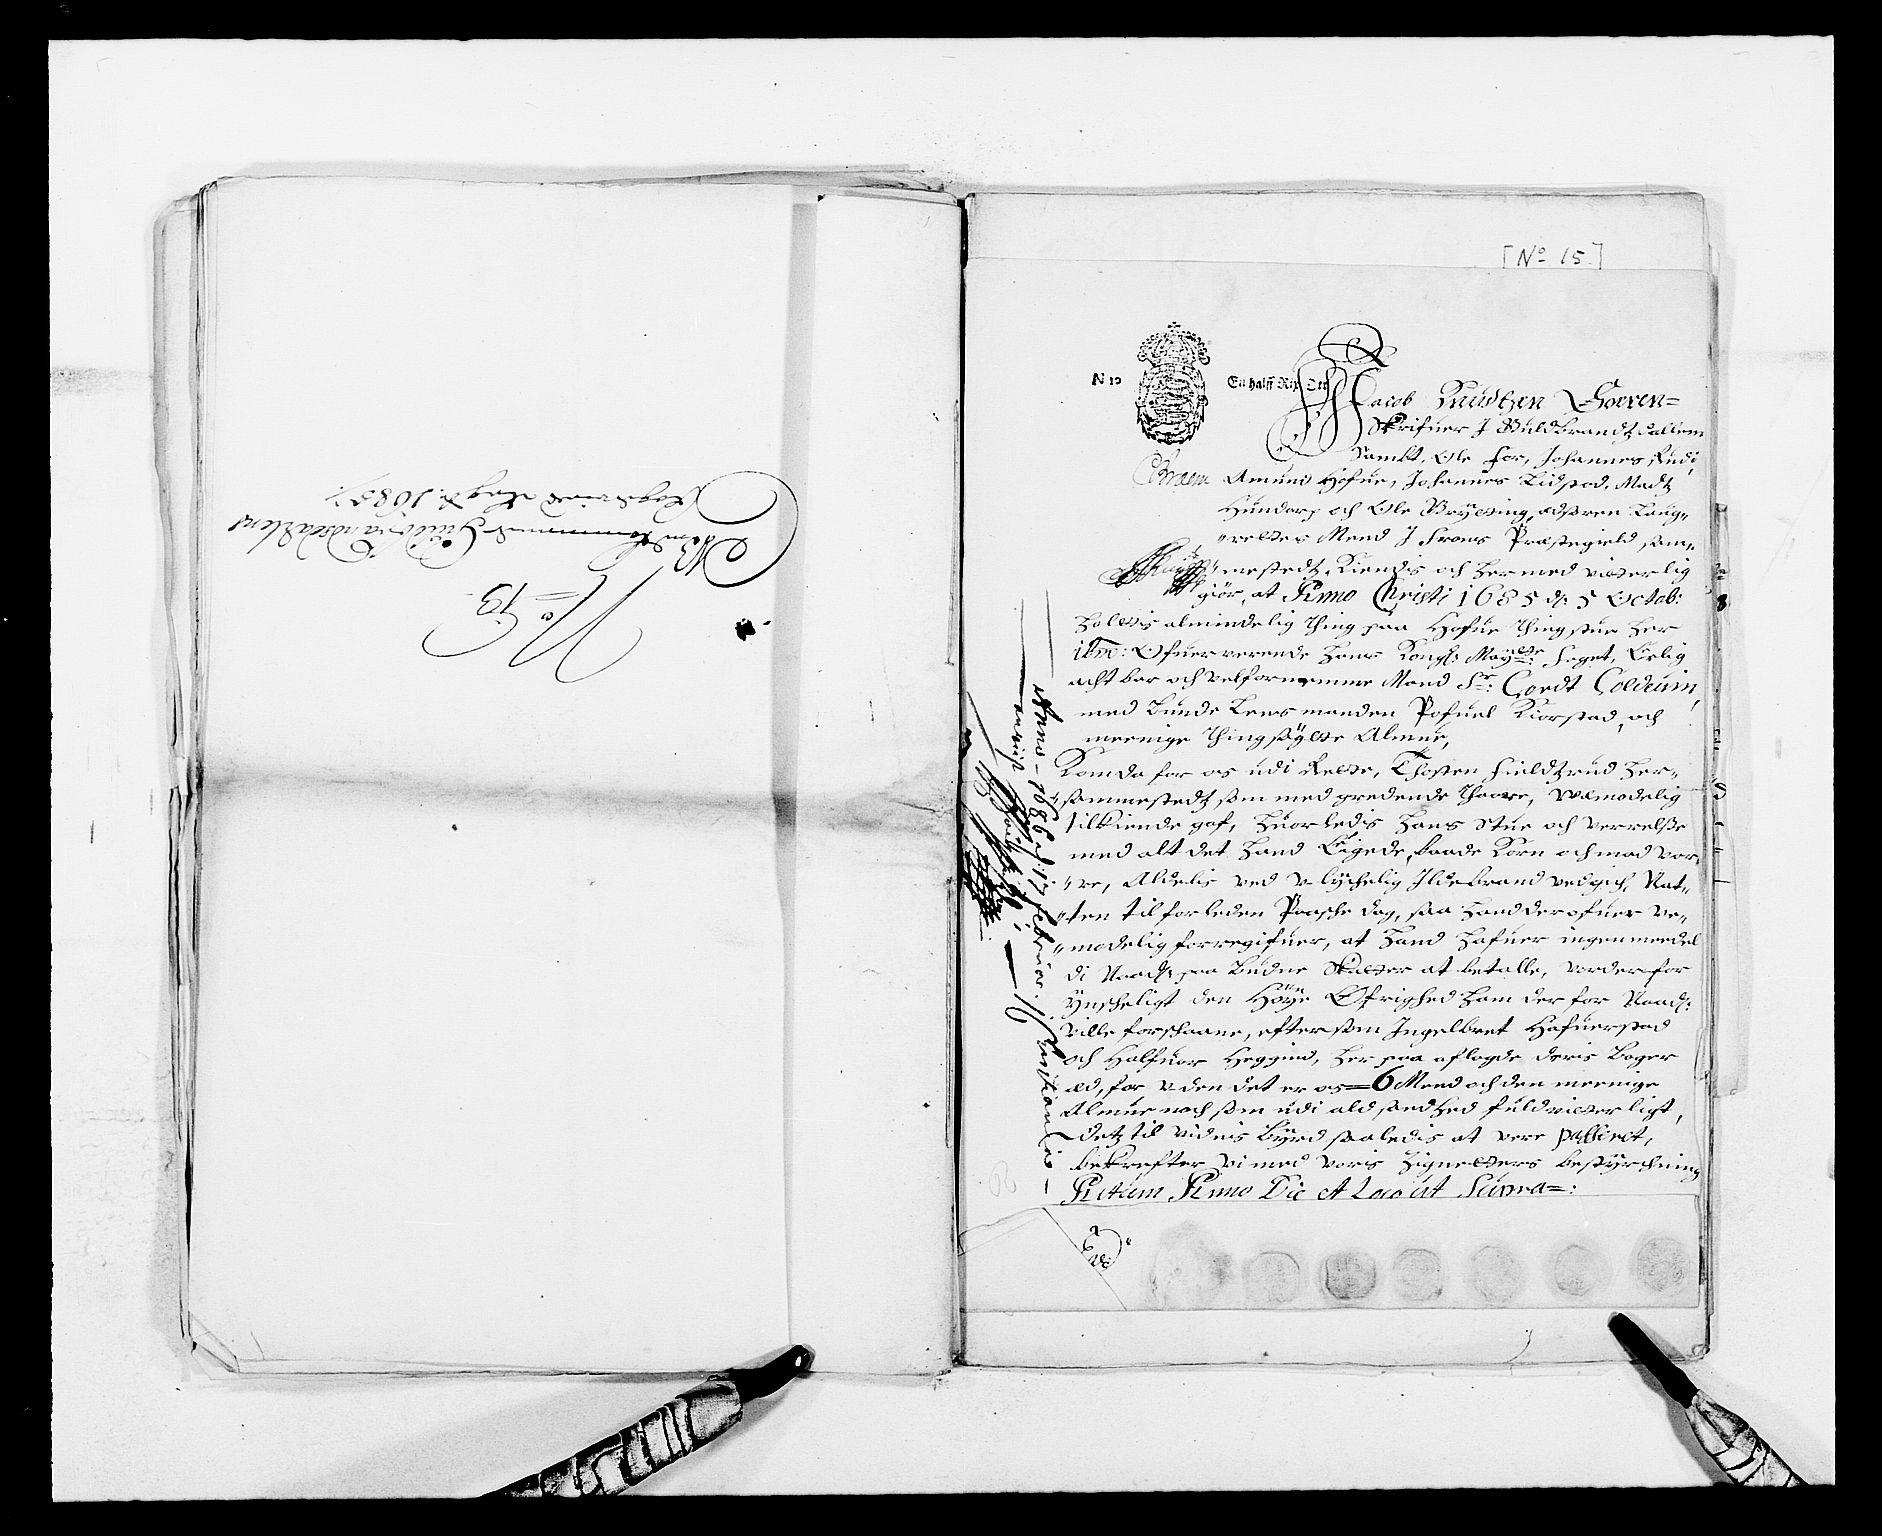 RA, Rentekammeret inntil 1814, Reviderte regnskaper, Fogderegnskap, R17/L1160: Fogderegnskap Gudbrandsdal, 1682-1689, s. 294